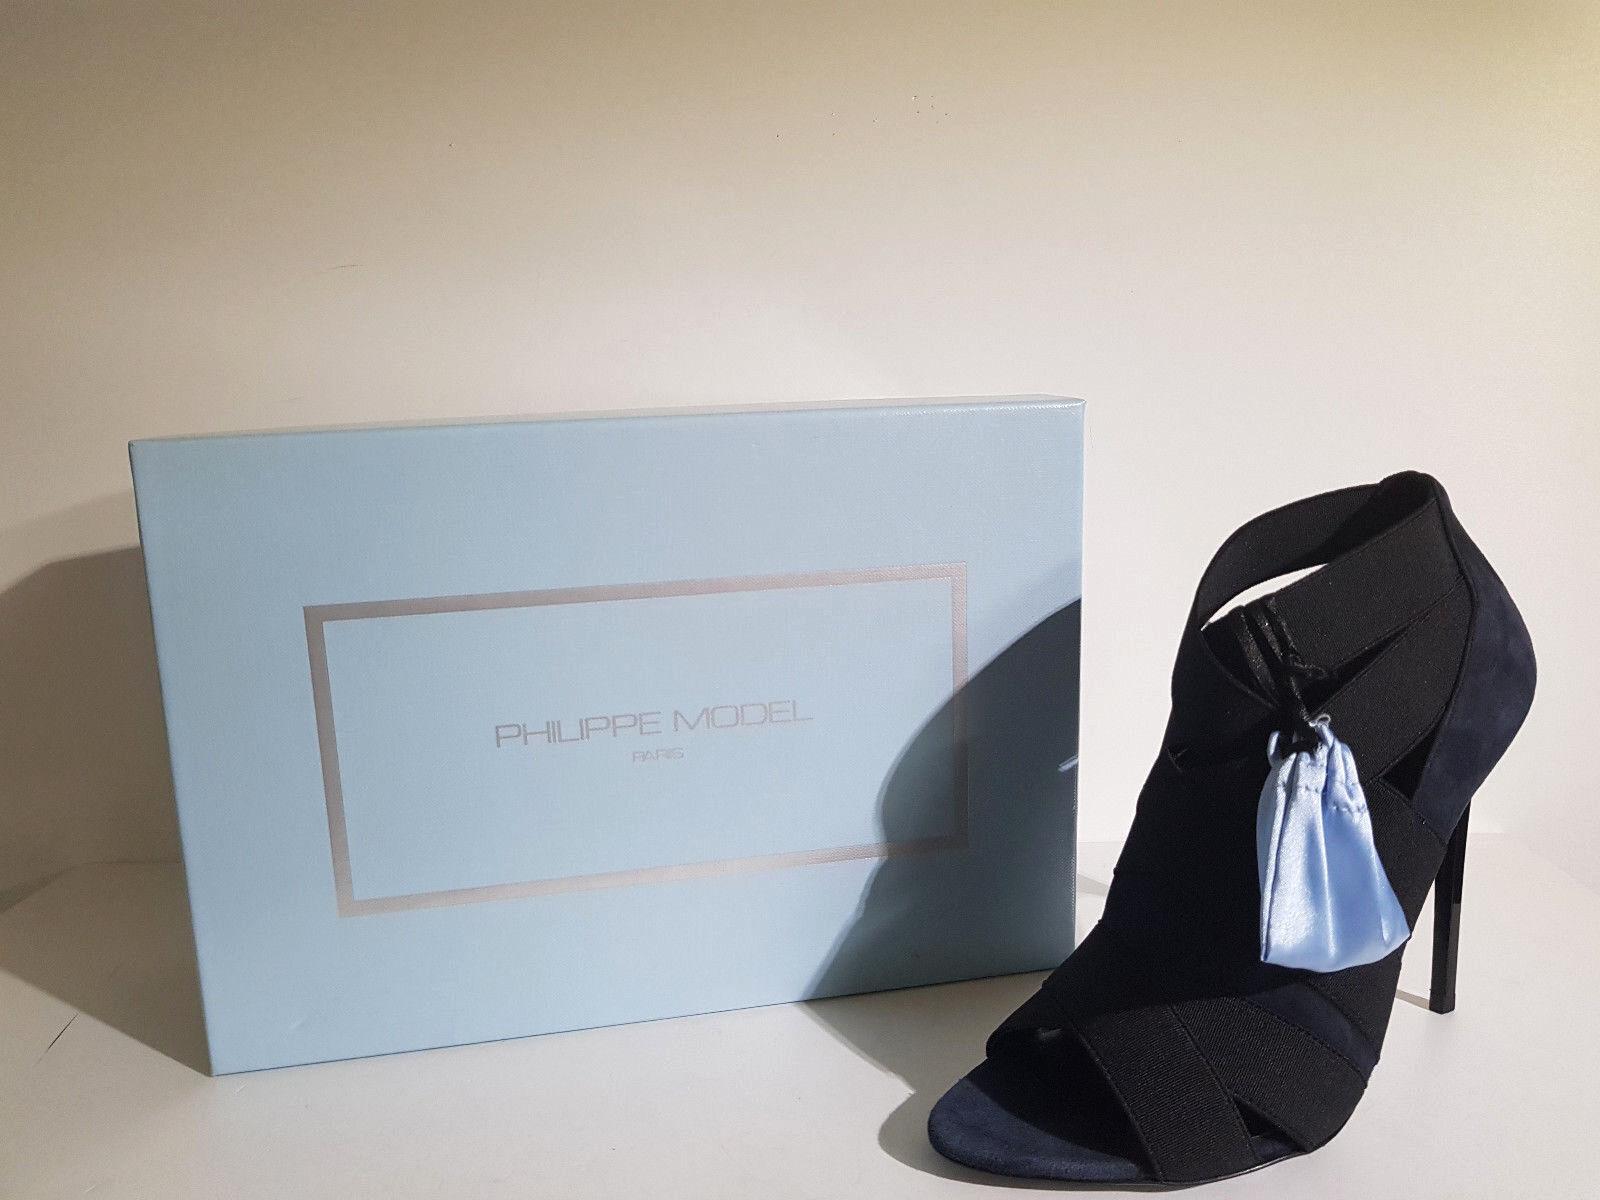 Philippe Modell Frau Pumps. Rabatt -70 % art. el 10 D08 N Col.Blau schwarz